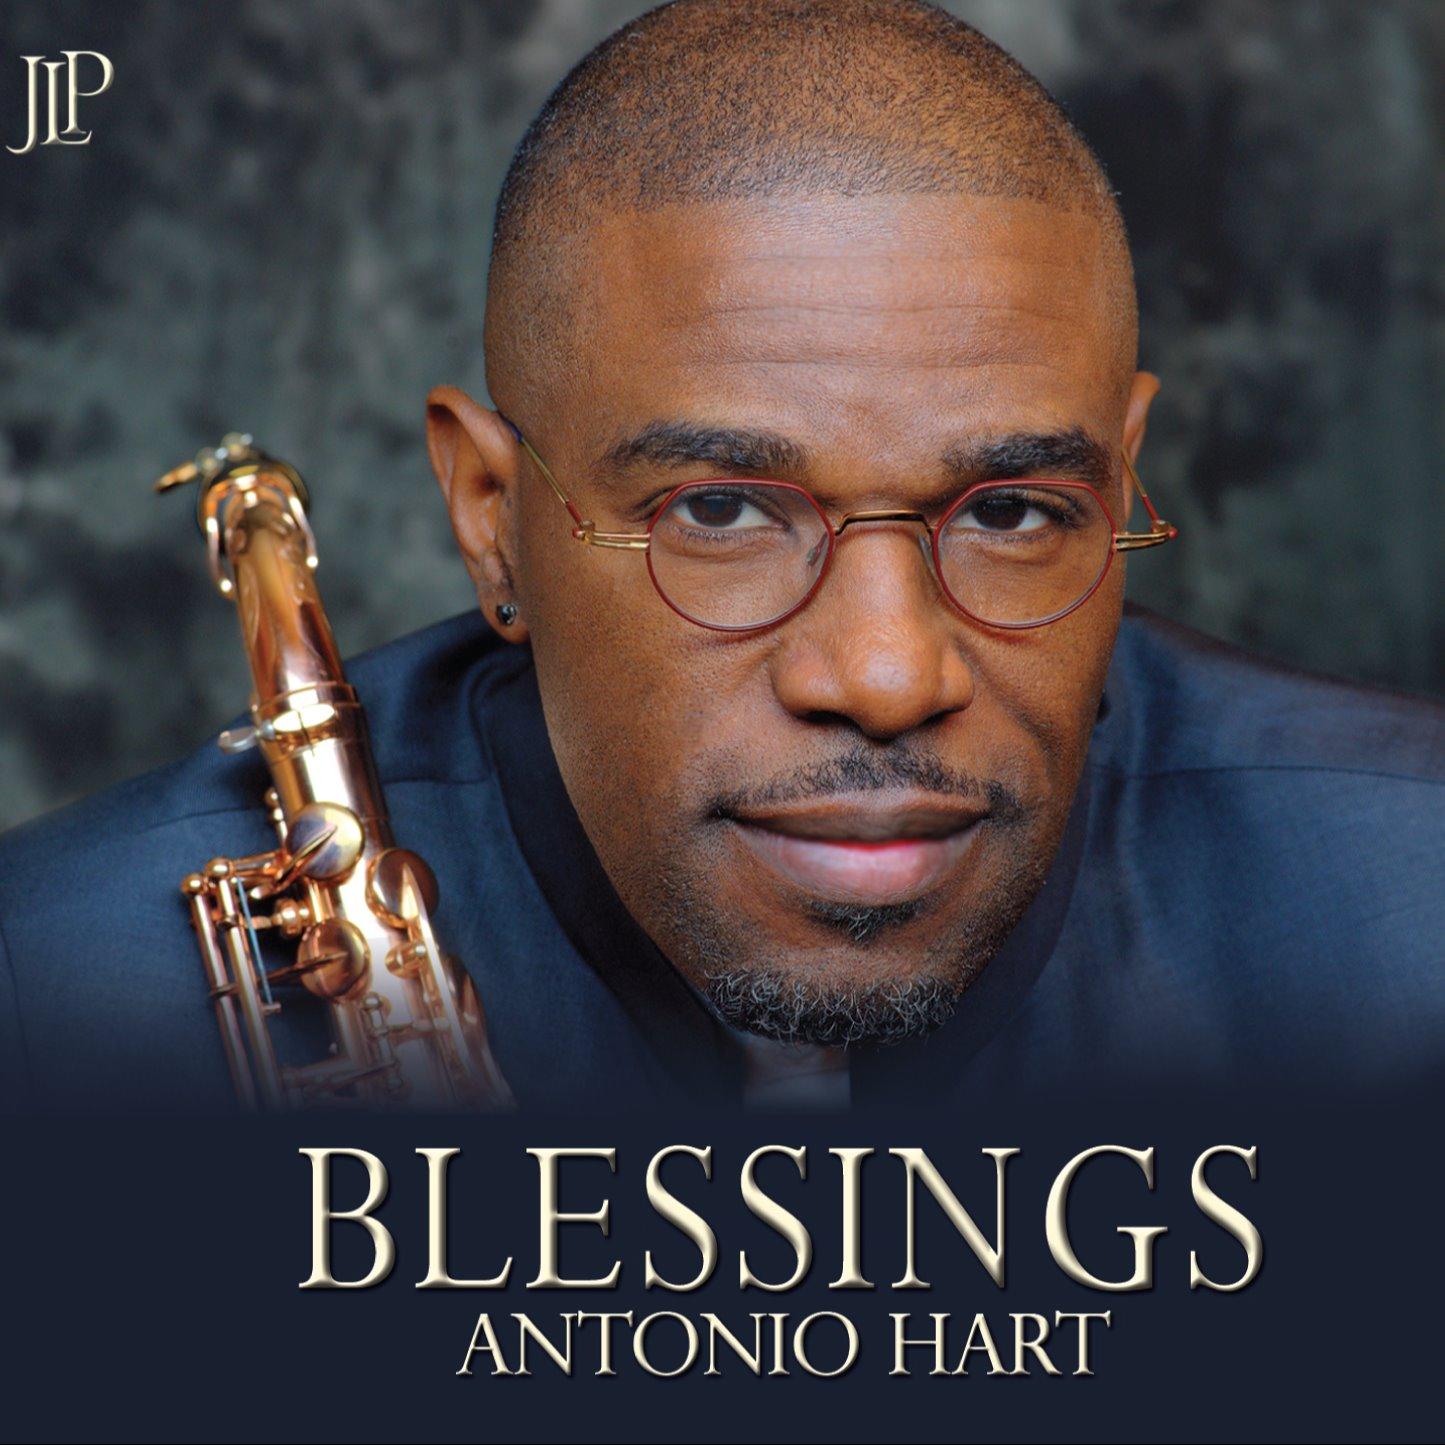 Jazz Legacy Productions BLESSINGS Antonio Hart Link Thumbnail | Linktree